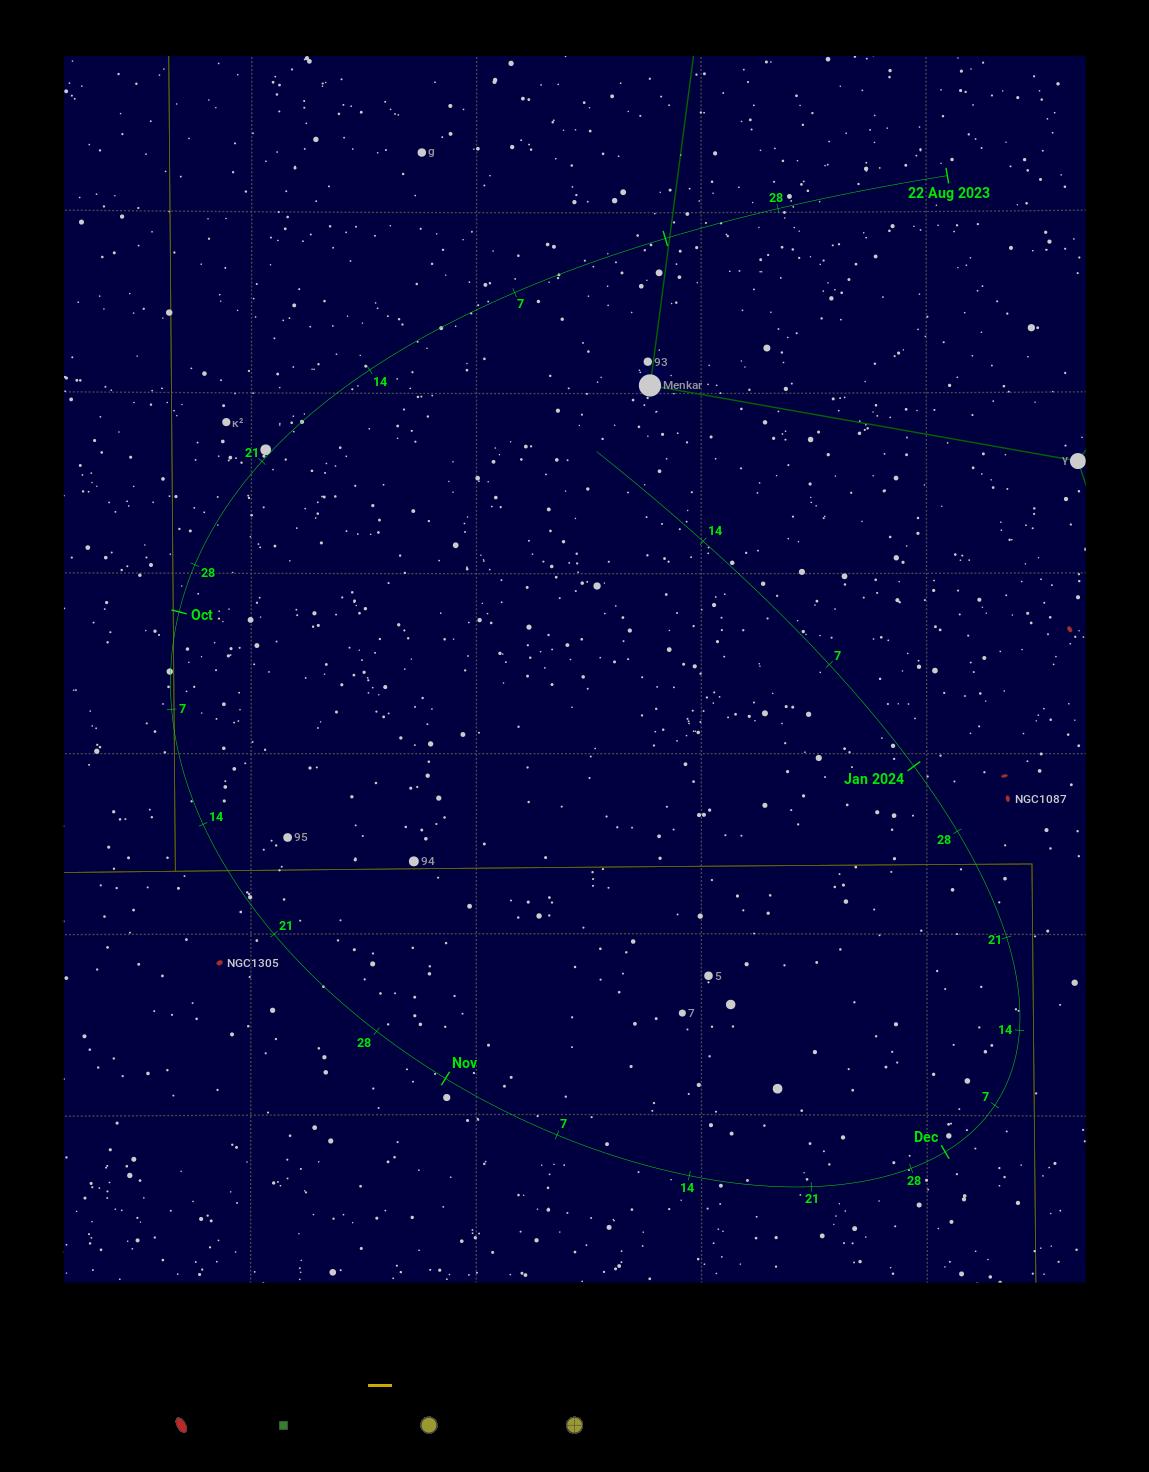 The path traced across the sky by 18 Melpomene